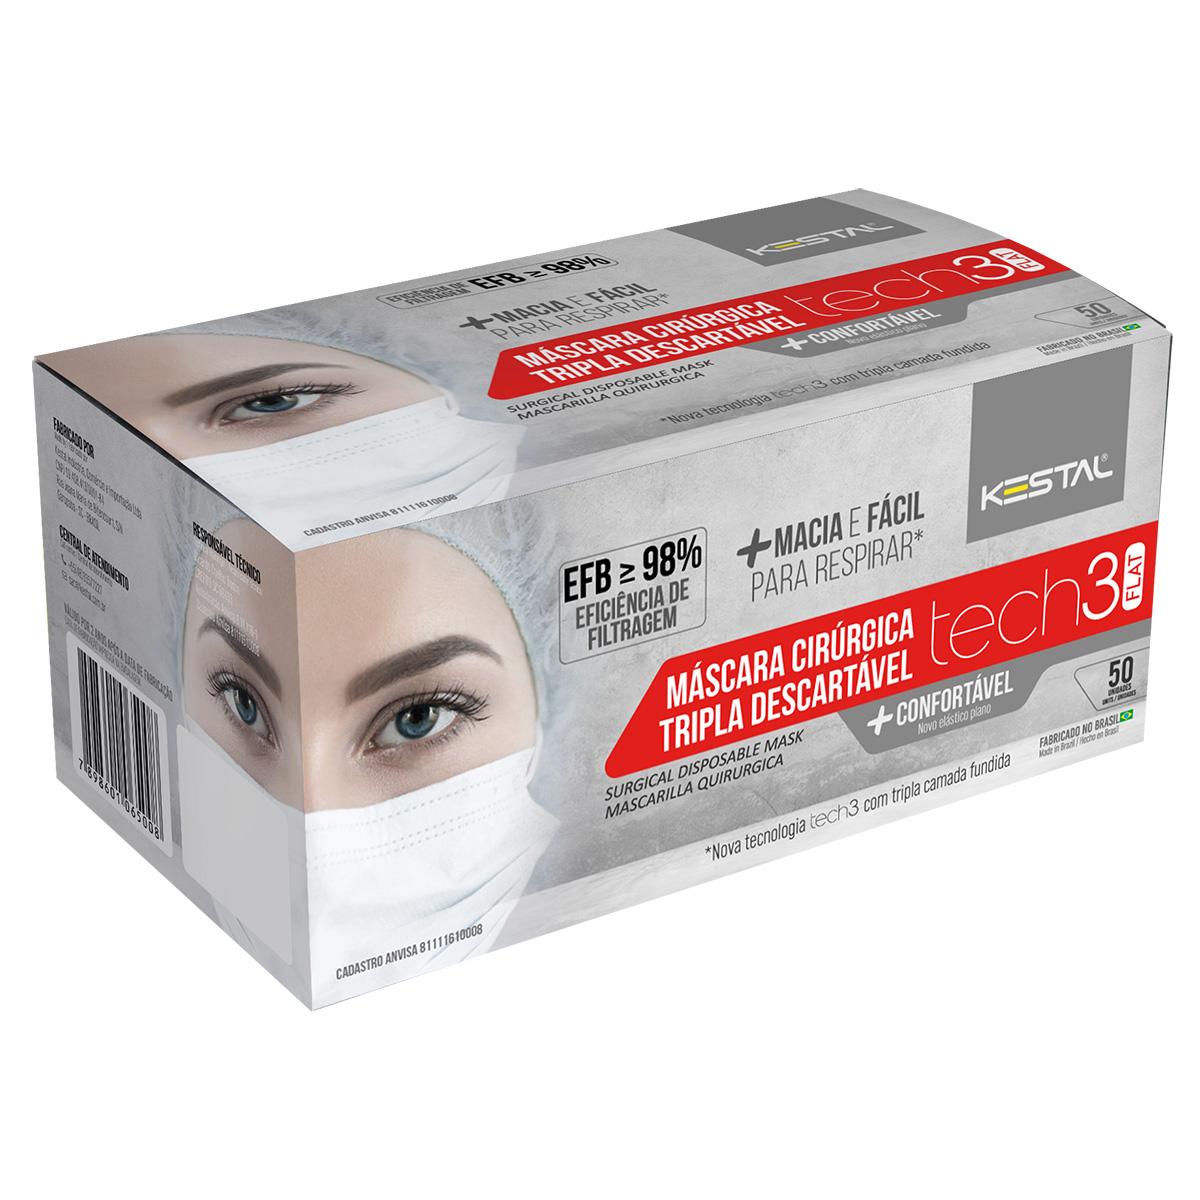 Mascara Cirurgica Tripla CX Com 50 unidades Kestal